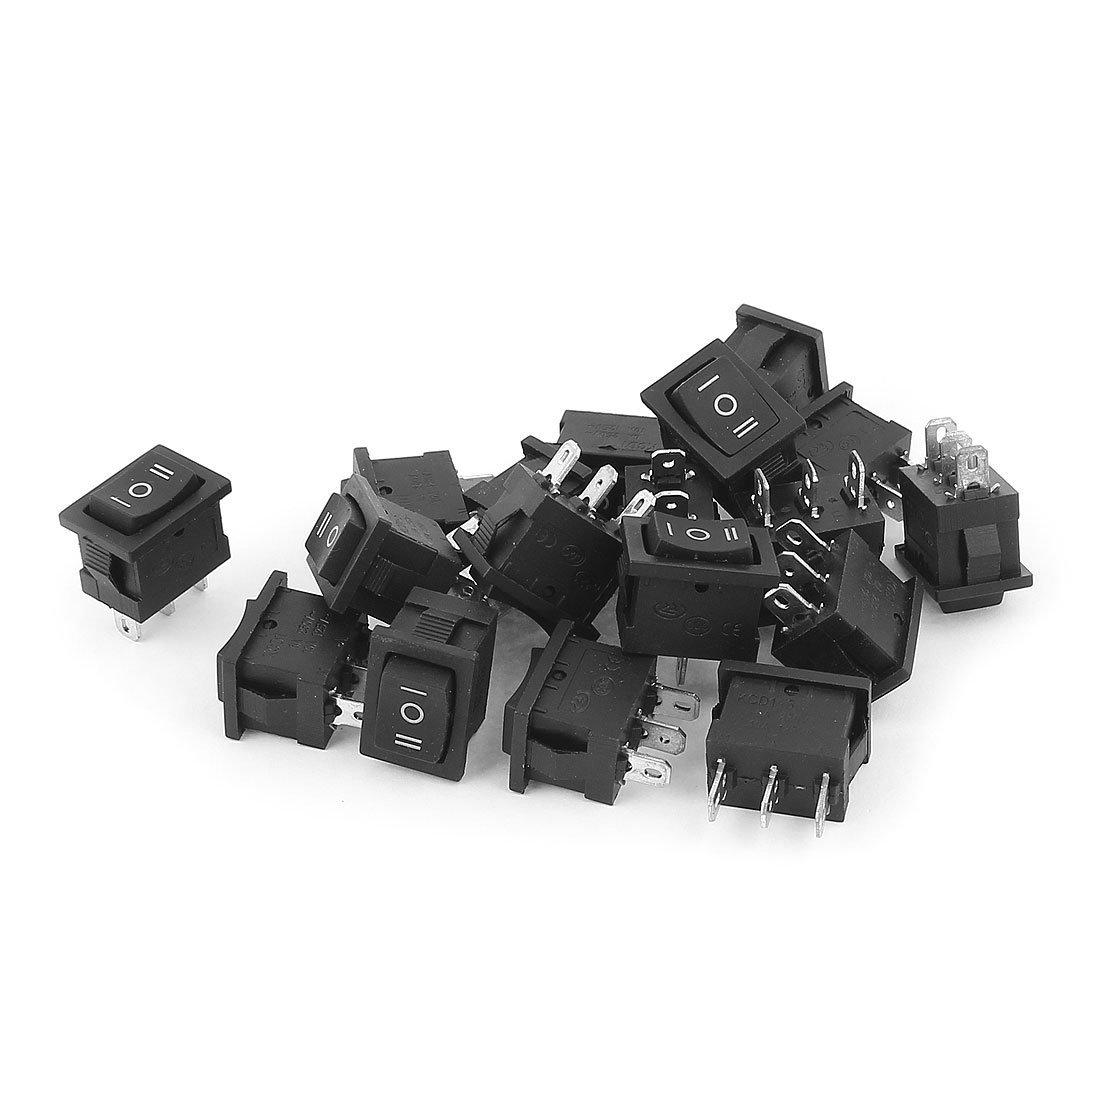 uxcell SPDT 3 Terminals 3 Position Rocker Switch AC 250V 6A AC125V 10A 18pcs